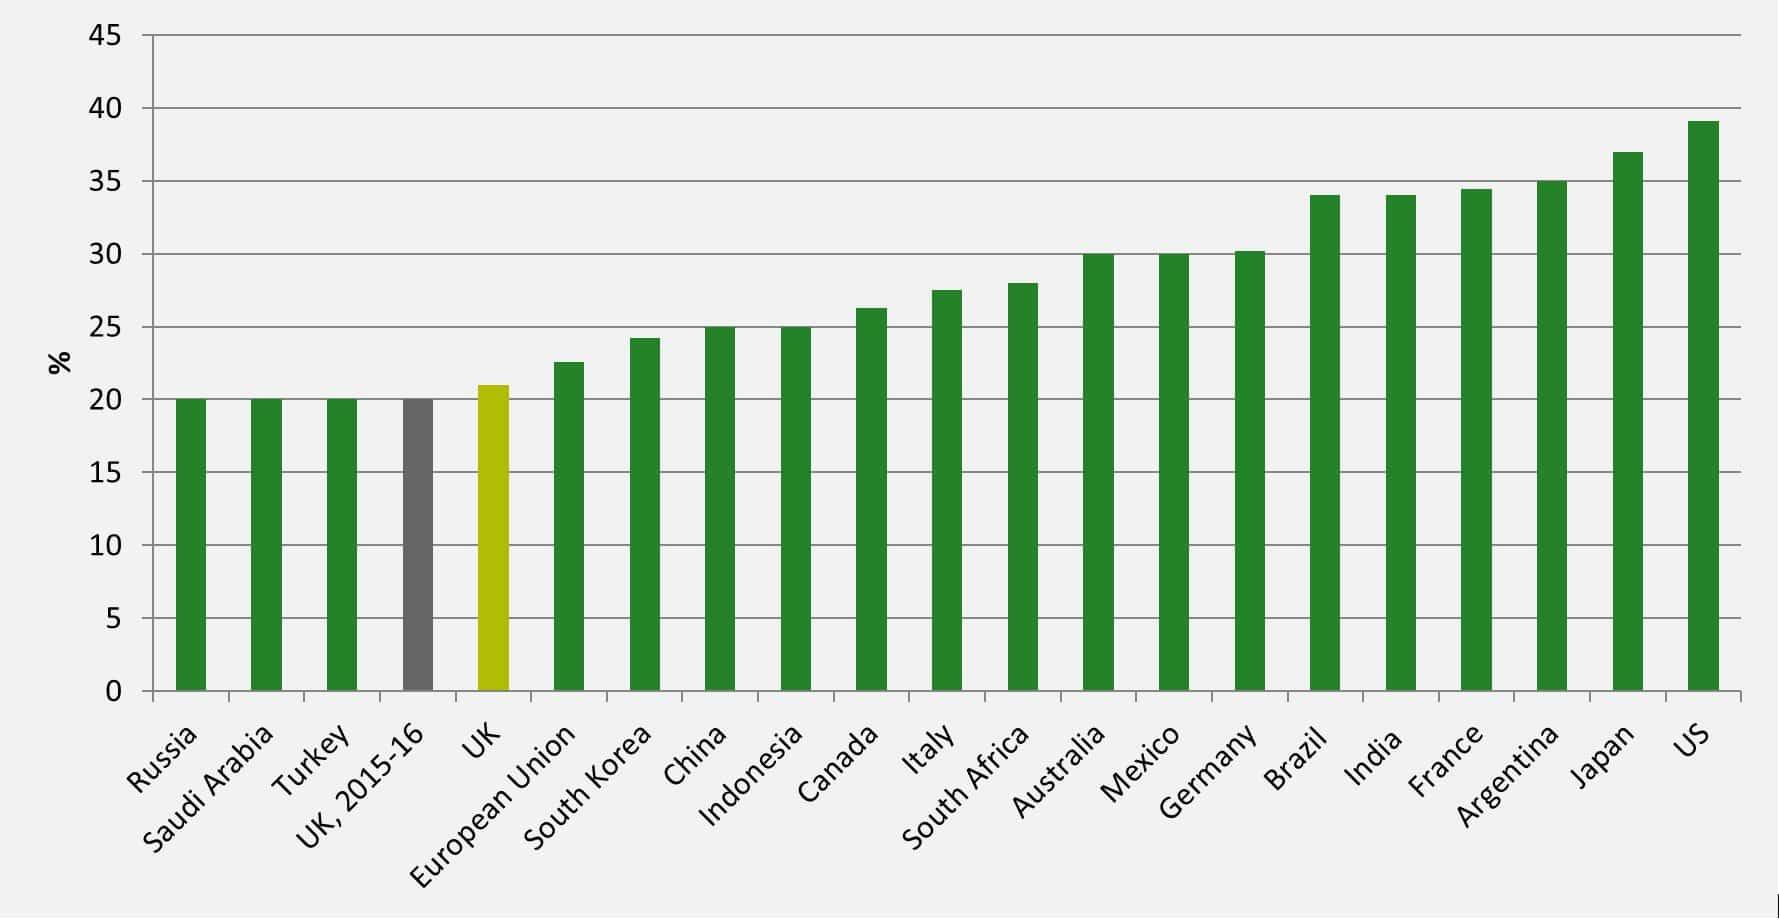 corporation-tax-rates